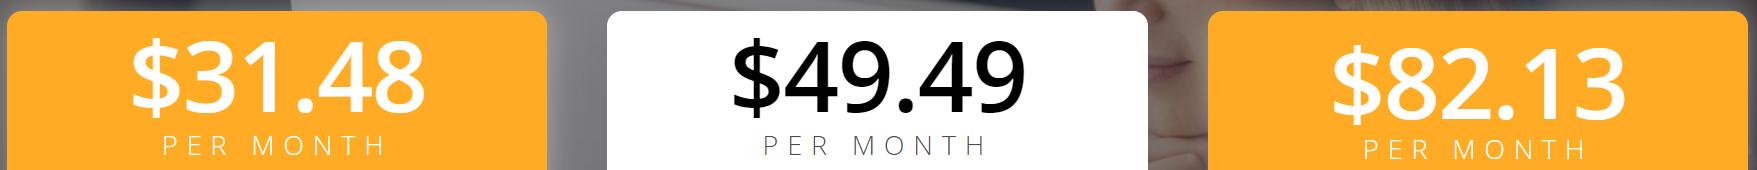 massivegrid-web hosting price2